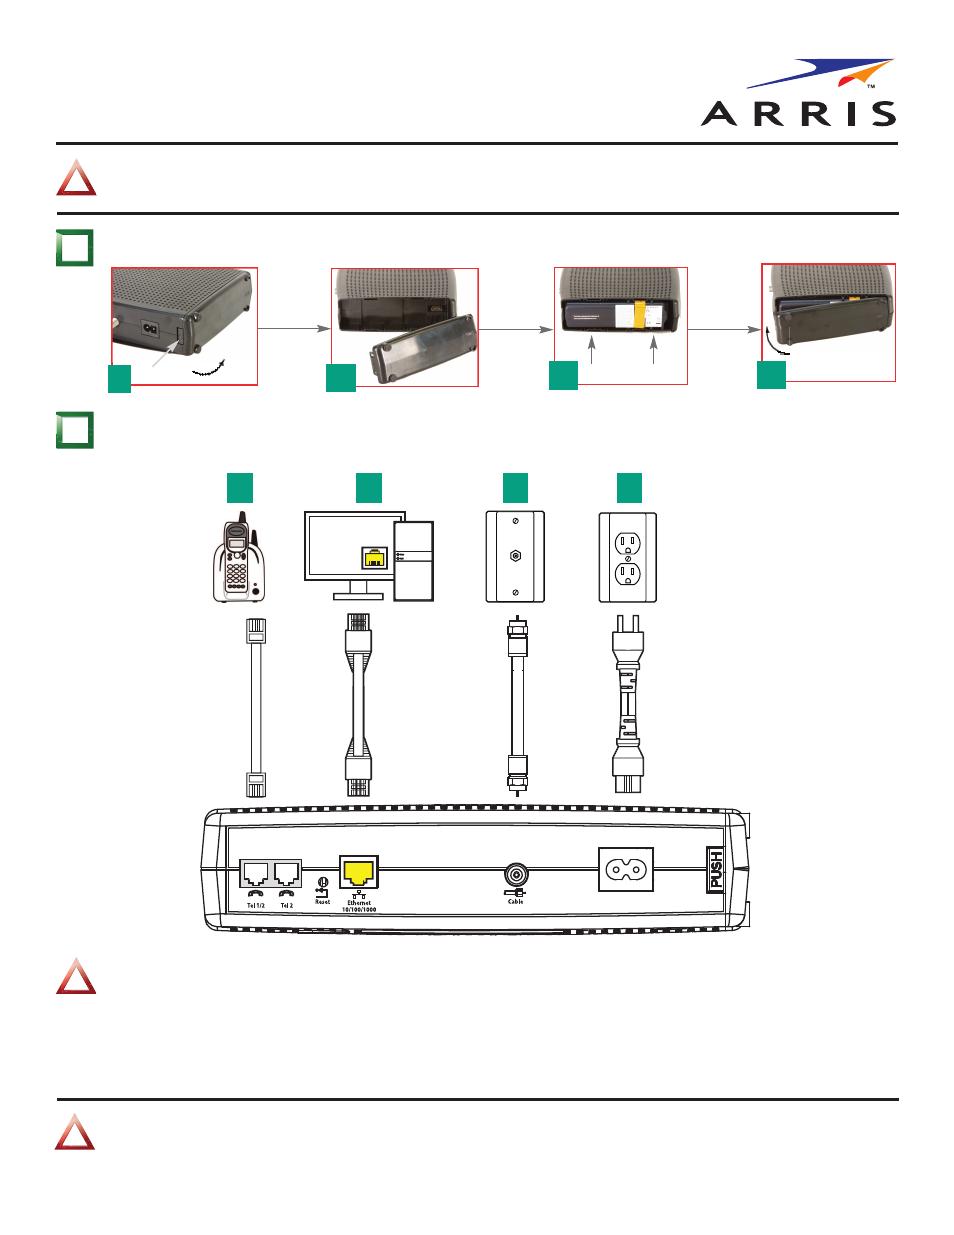 arris tm722g ct quick start guide user manual 2 pages rh manualsdir com Comcast Telephony Modem Arris TM722G Arris TM822G